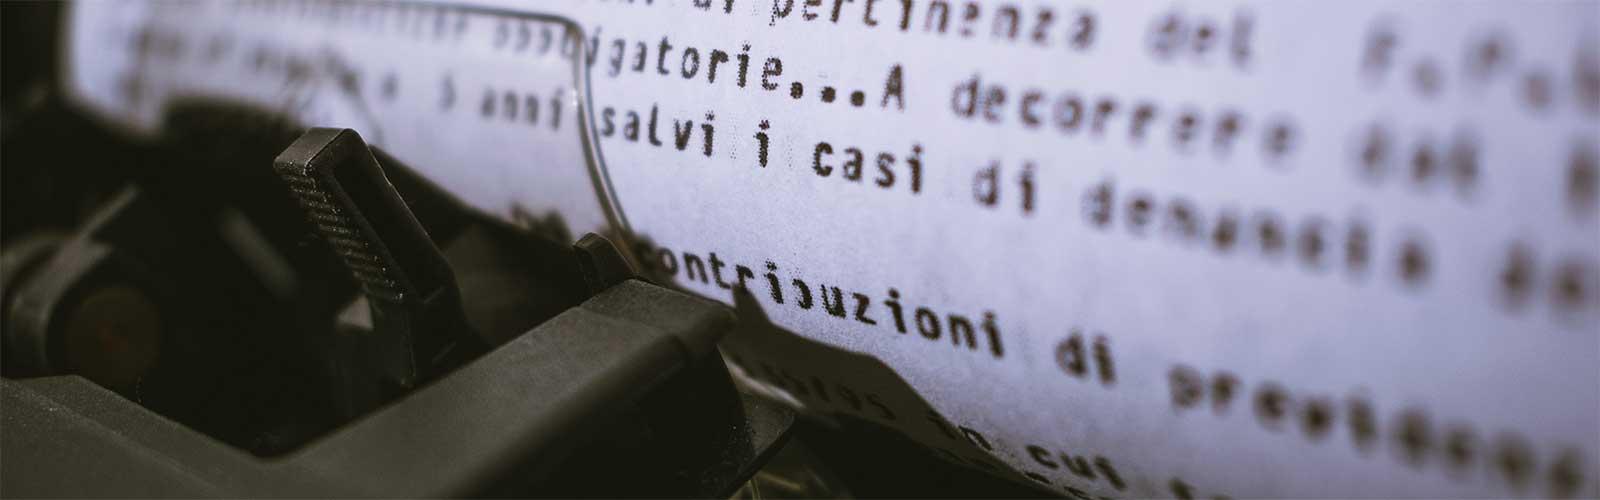 SEO Tips: Integrating Keywords Into Content